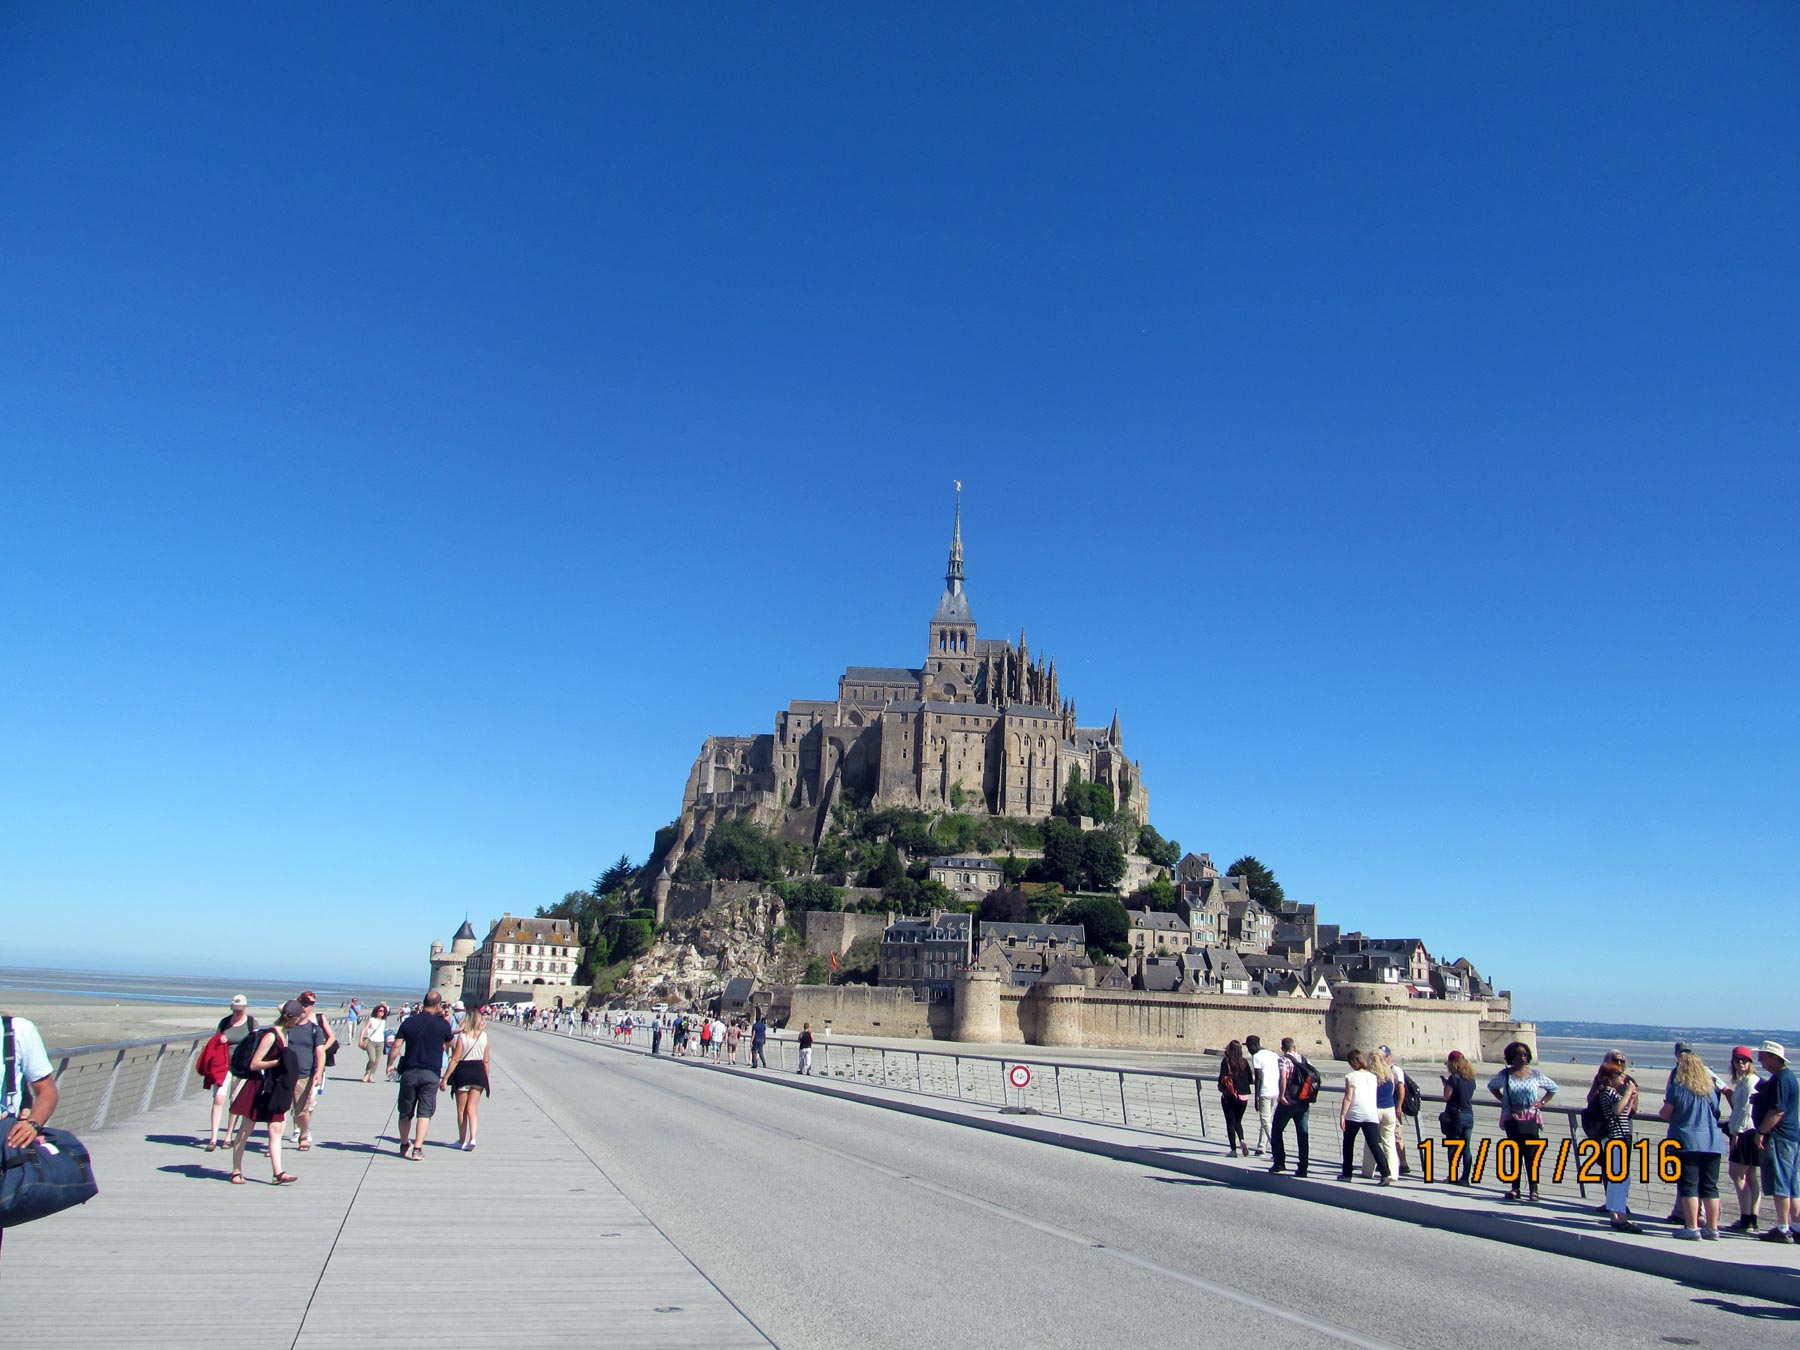 экскурсия из Парижа в Мон Сен Мишель